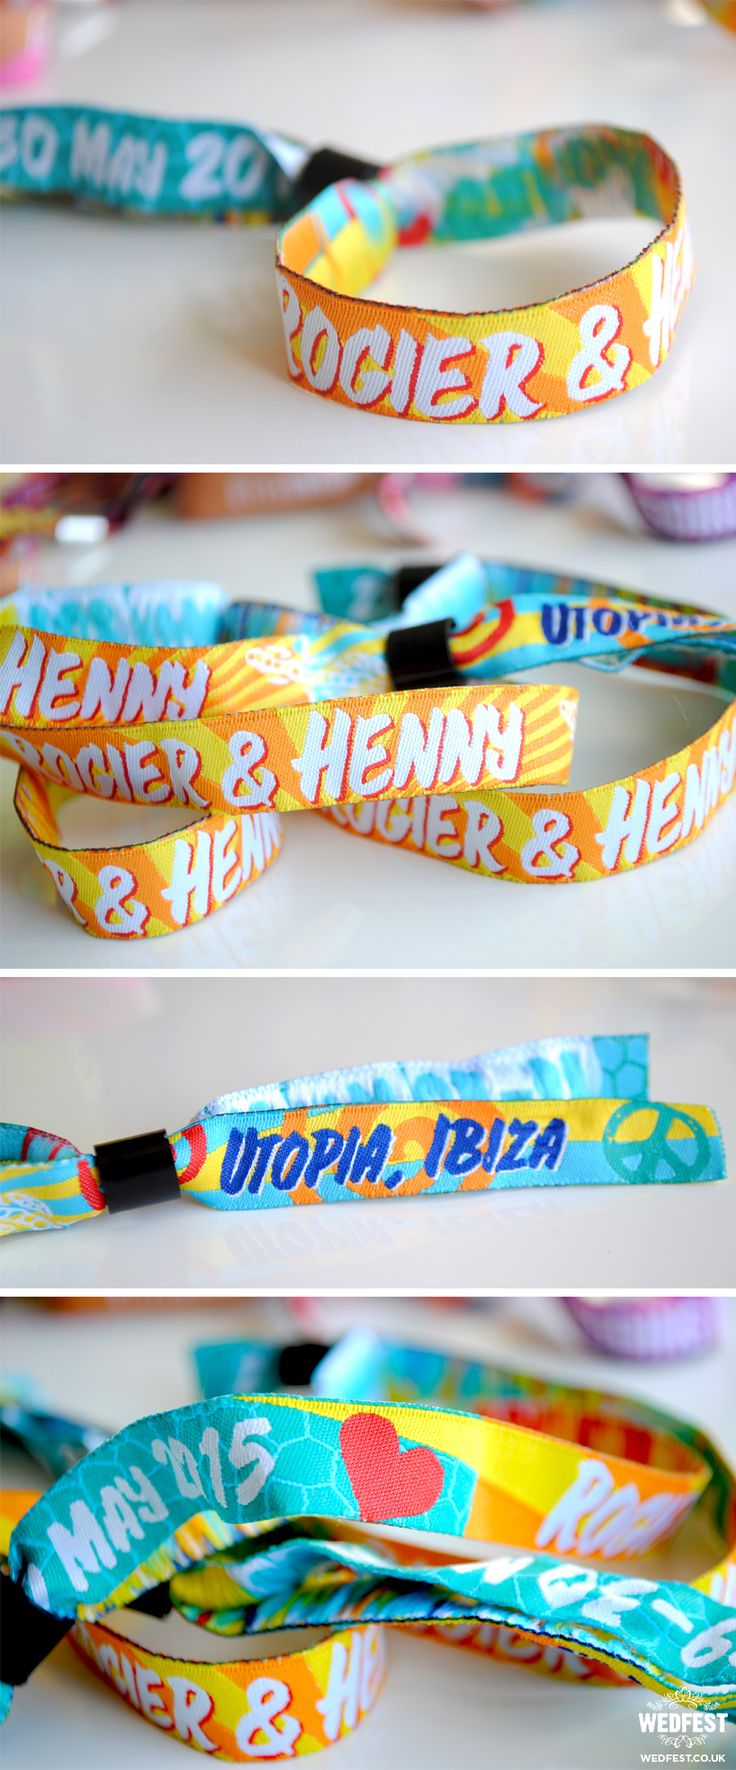 Ibiza Wedding Fabric Wristbands http://www.wedfest.co/custom-personalised-wristbands/